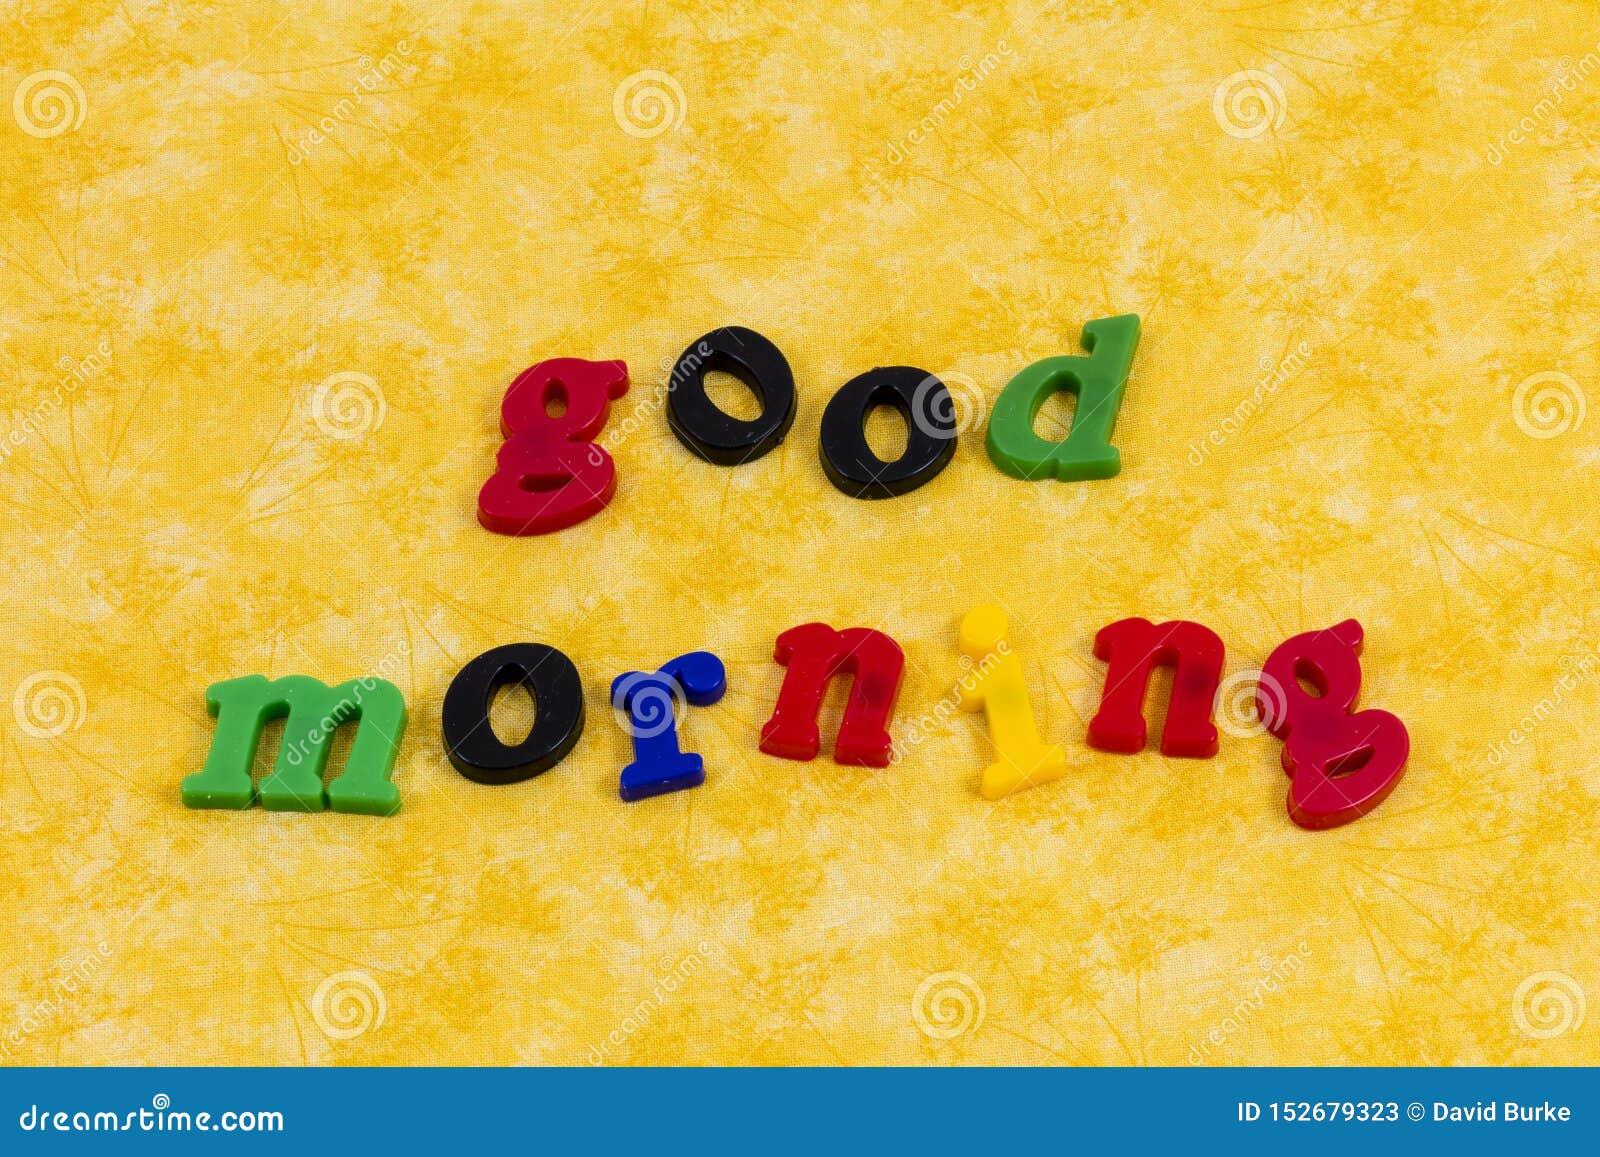 Good morning darling love couple happy greeting sunshine